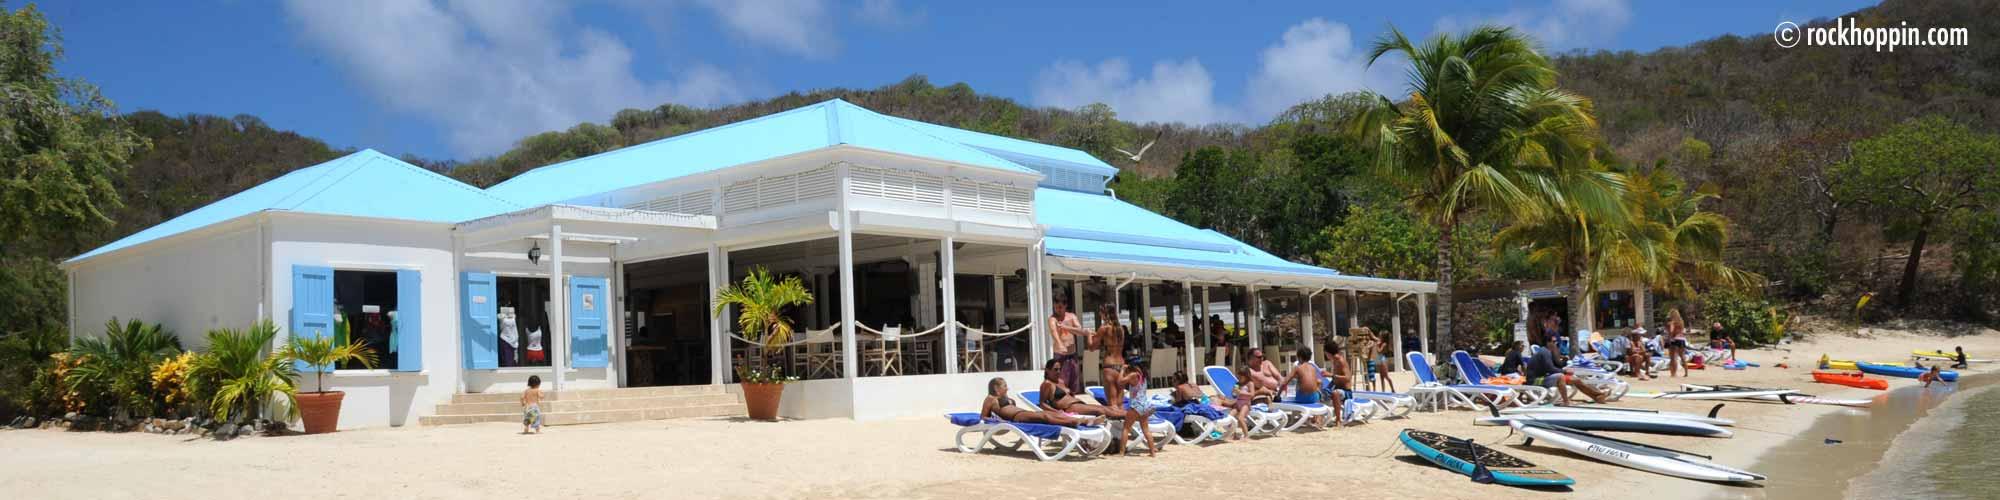 Pirates Bight Bar on Norman Island, BVI